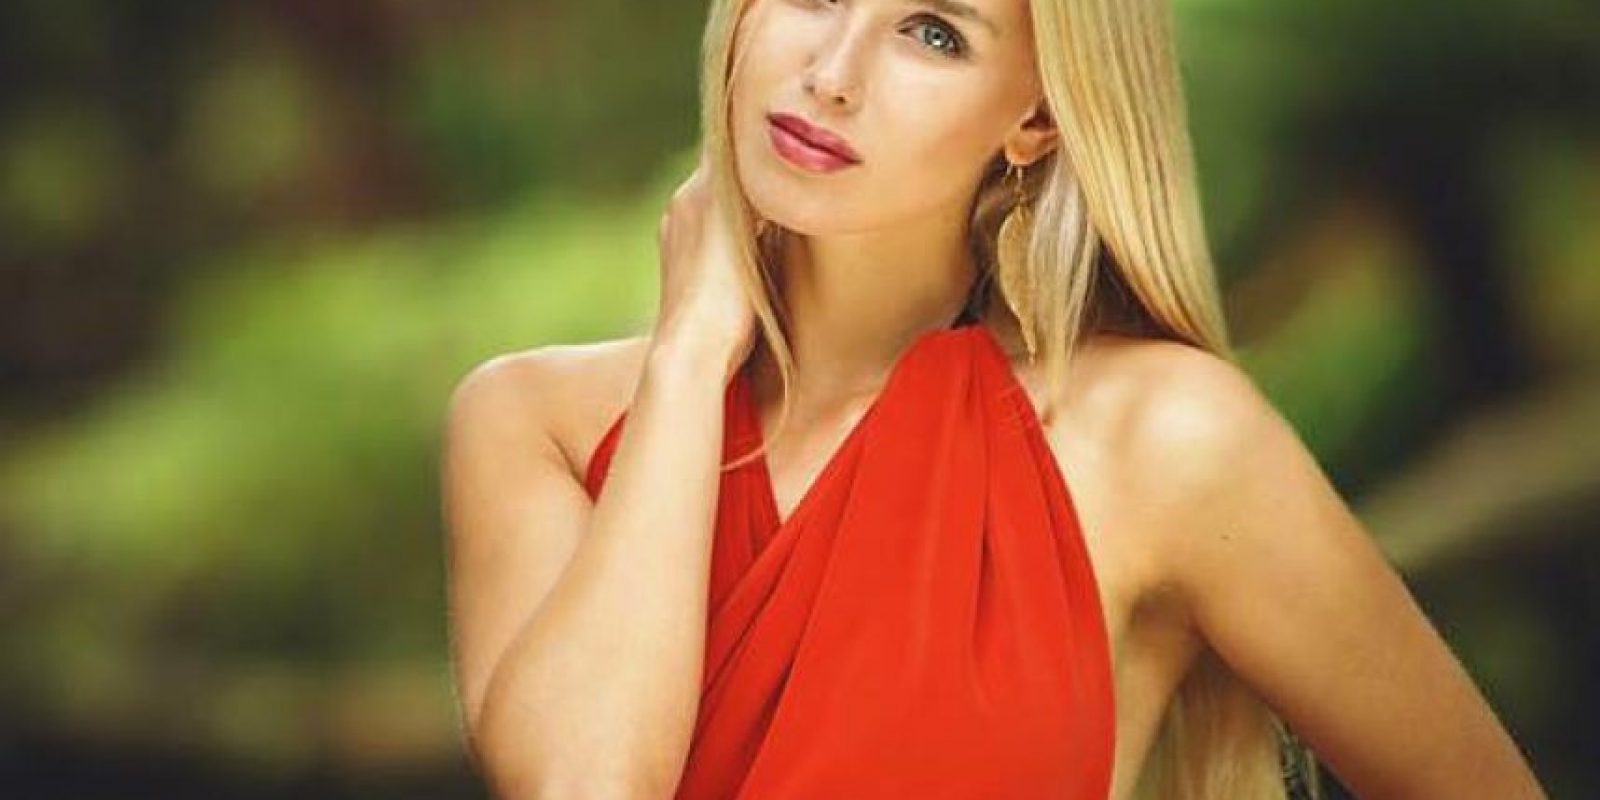 Scarlett Gartmann, novia de Marco Reus